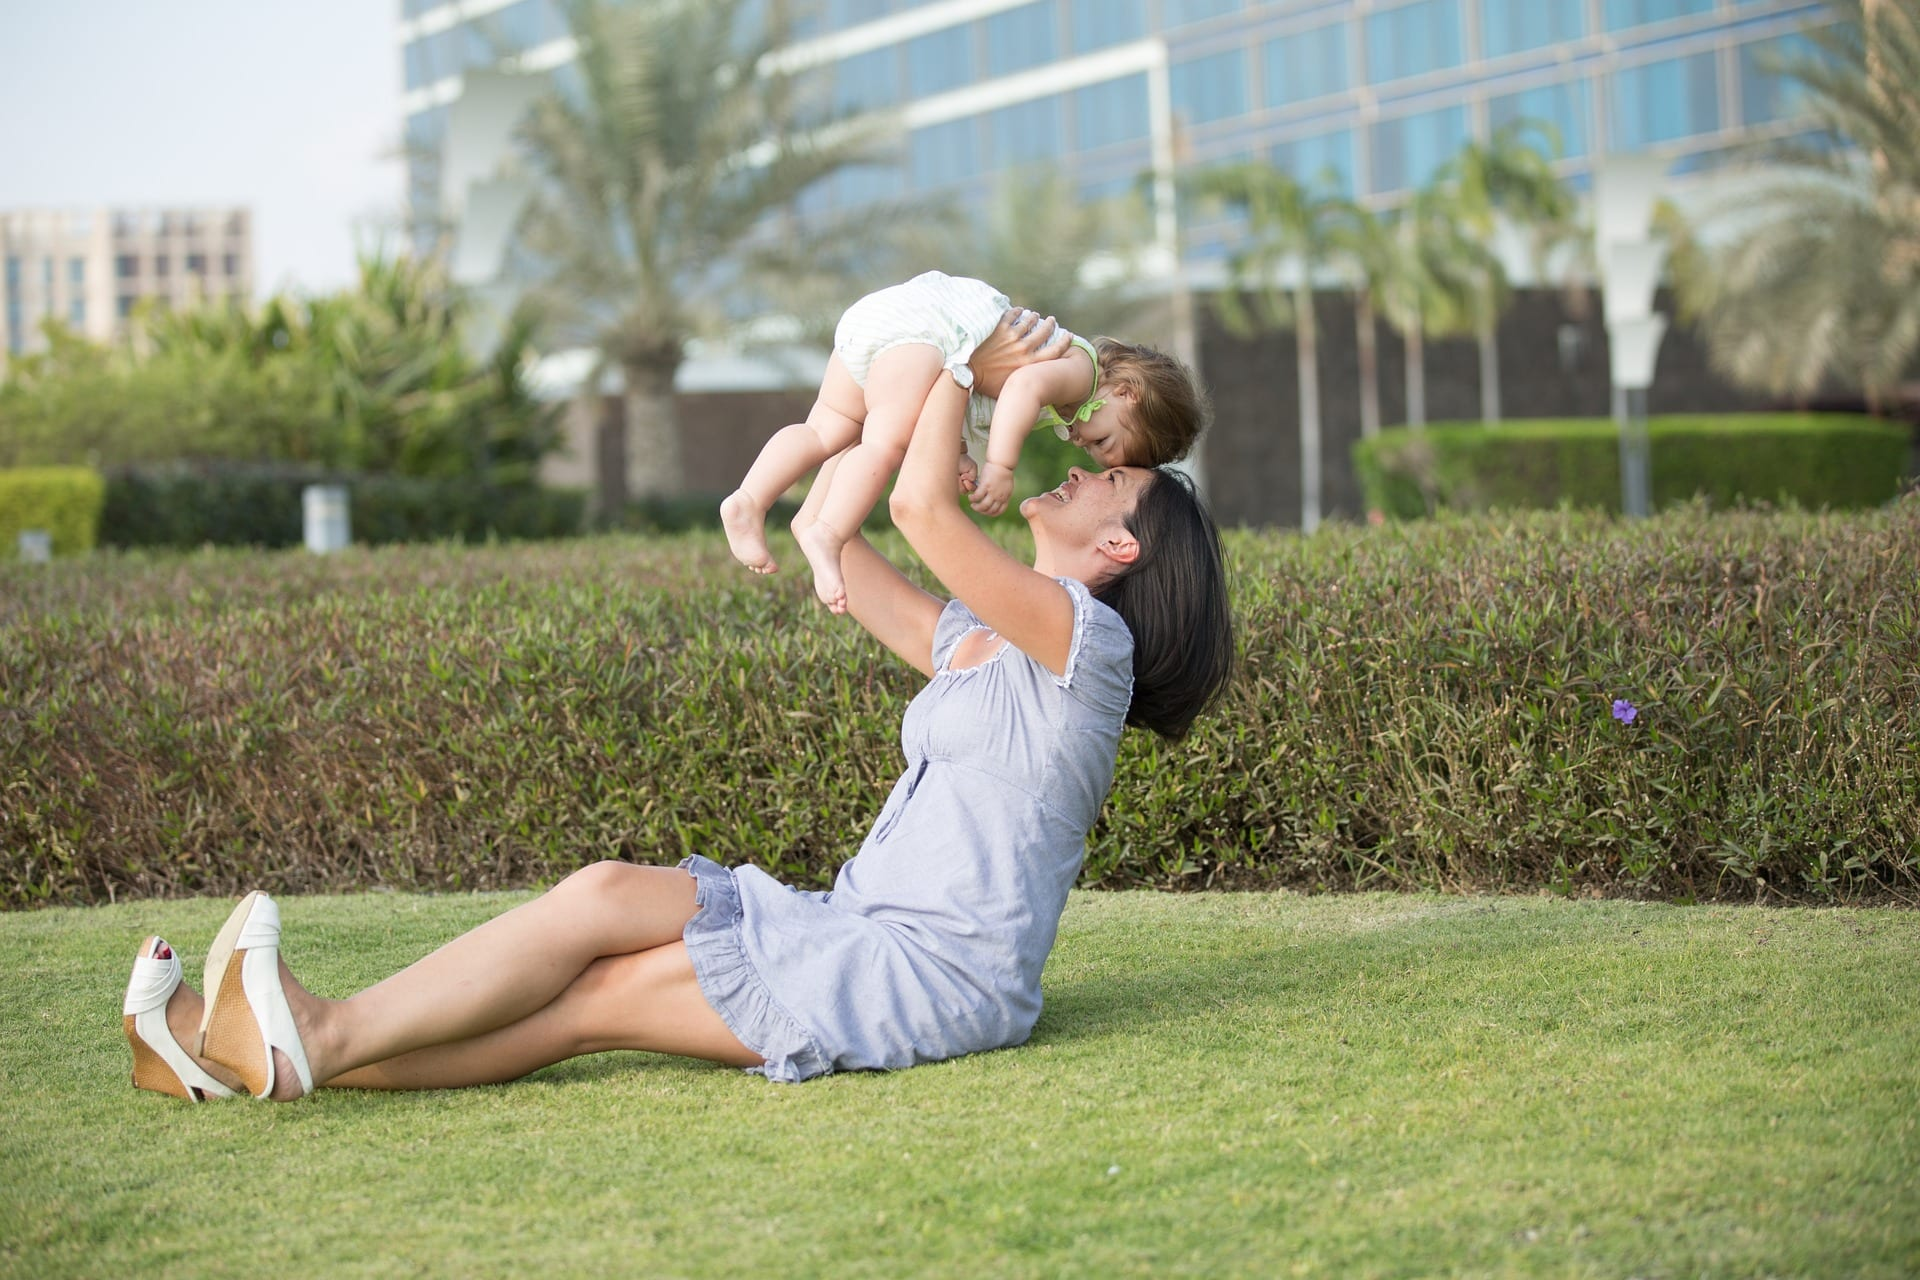 5 Types of Adoption in Ohio